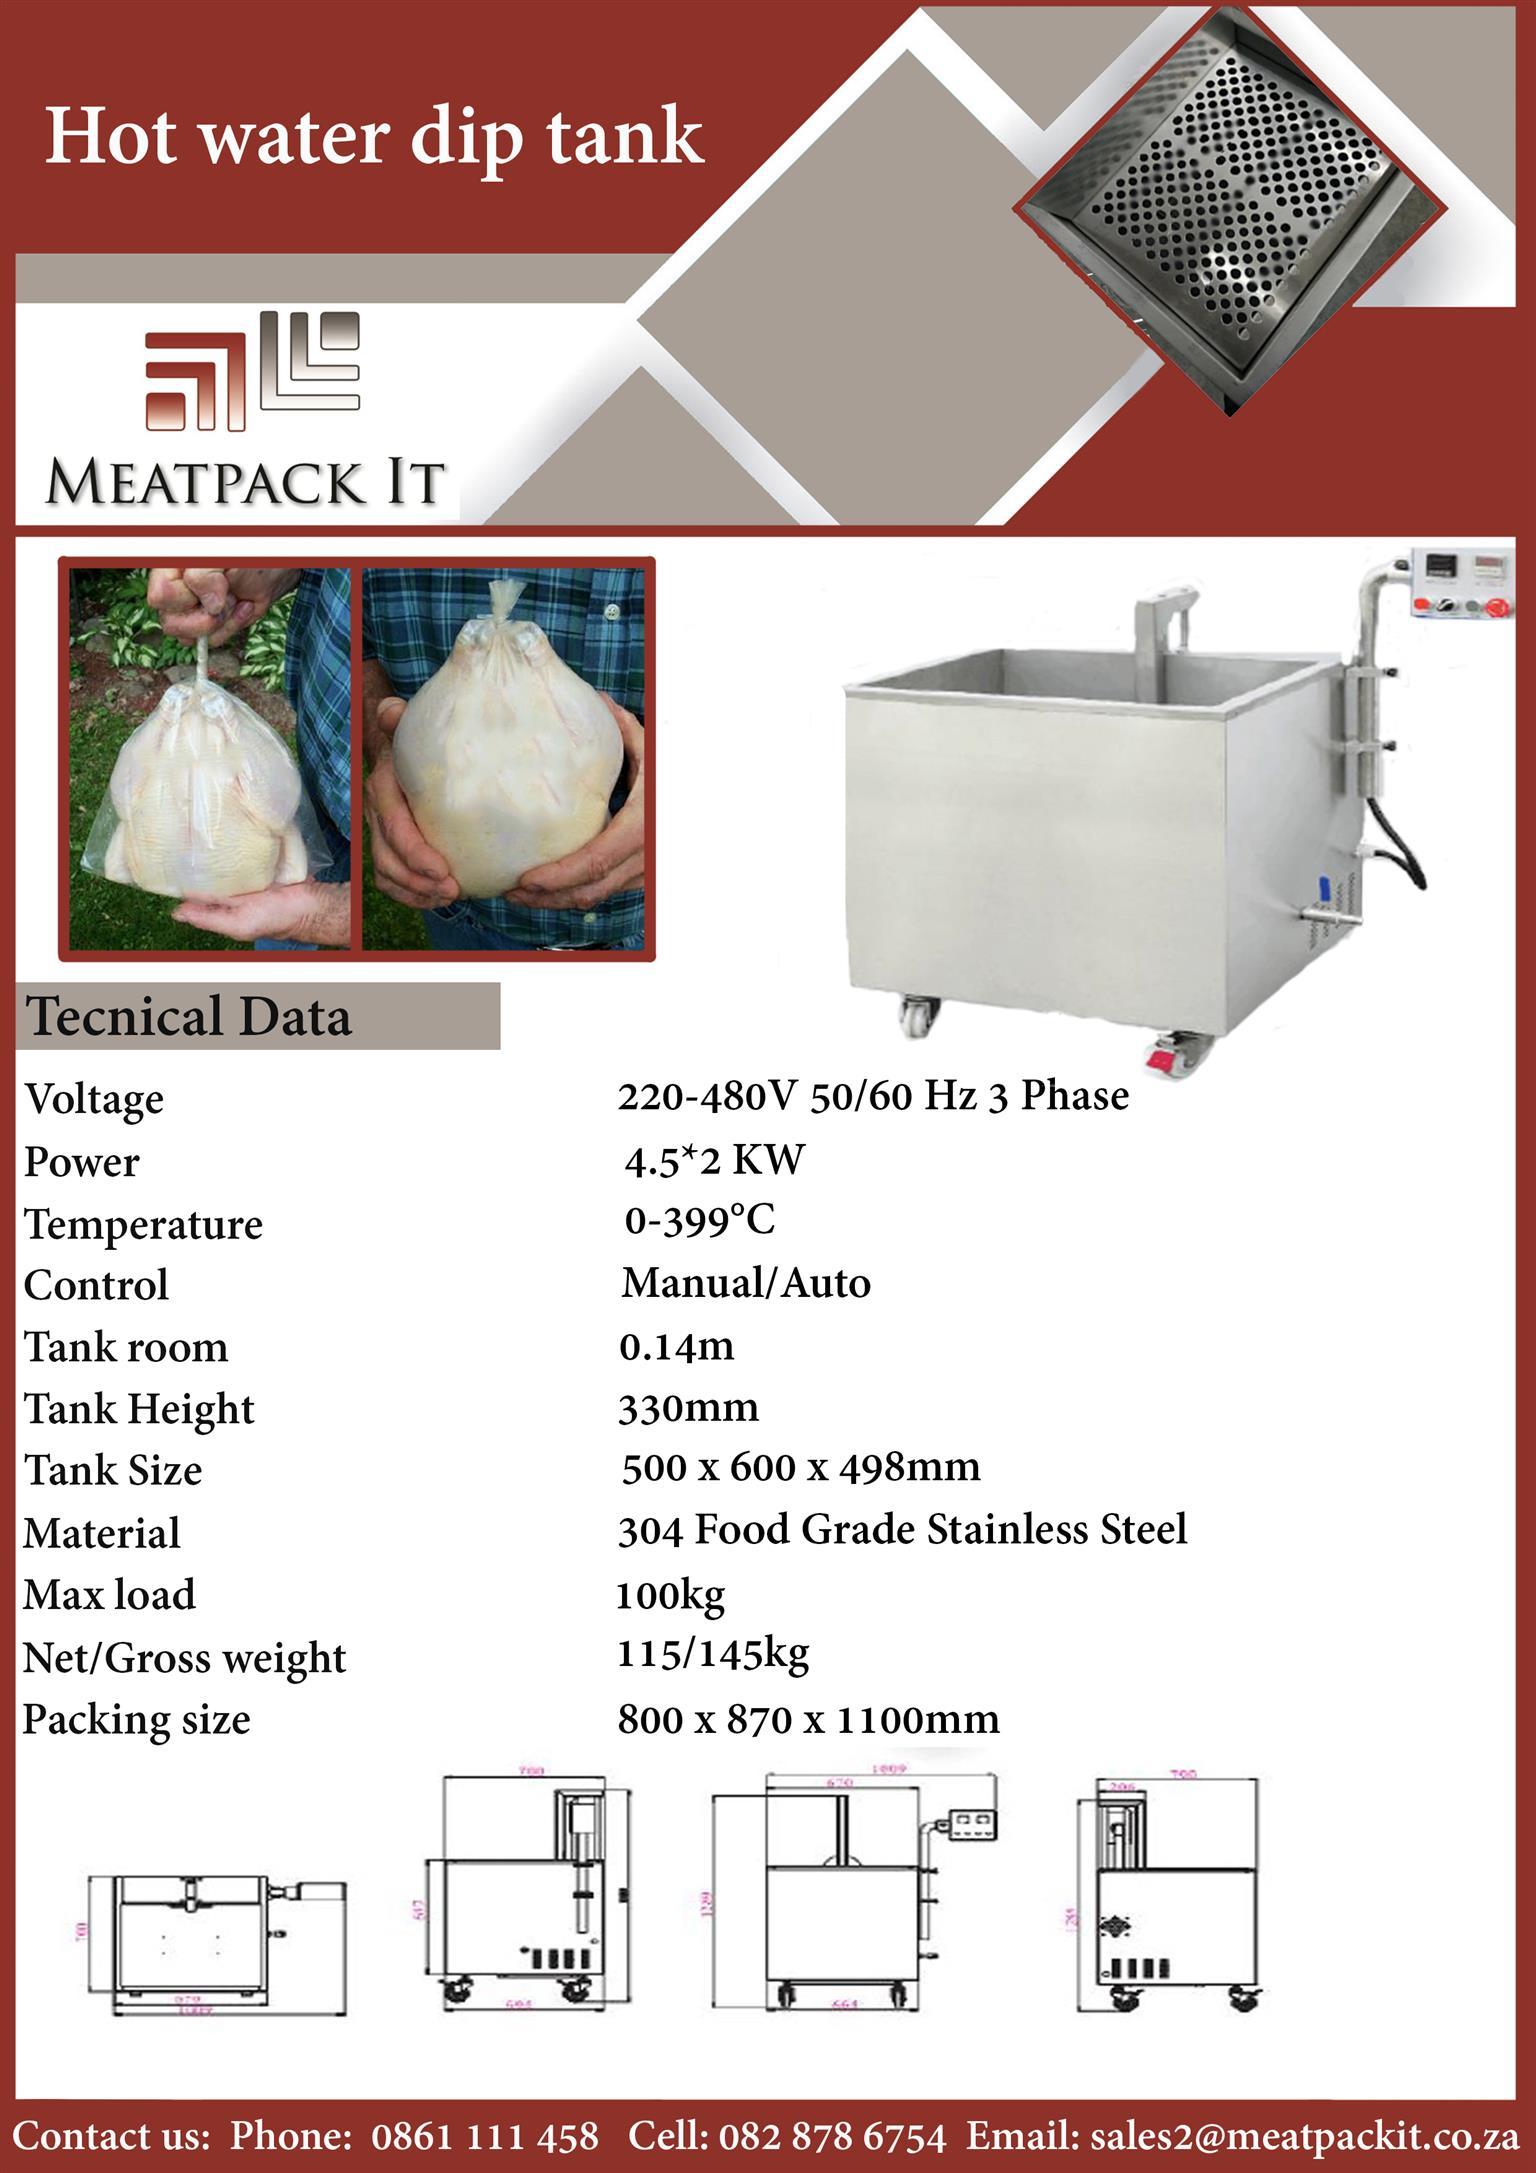 Hot water dip tank